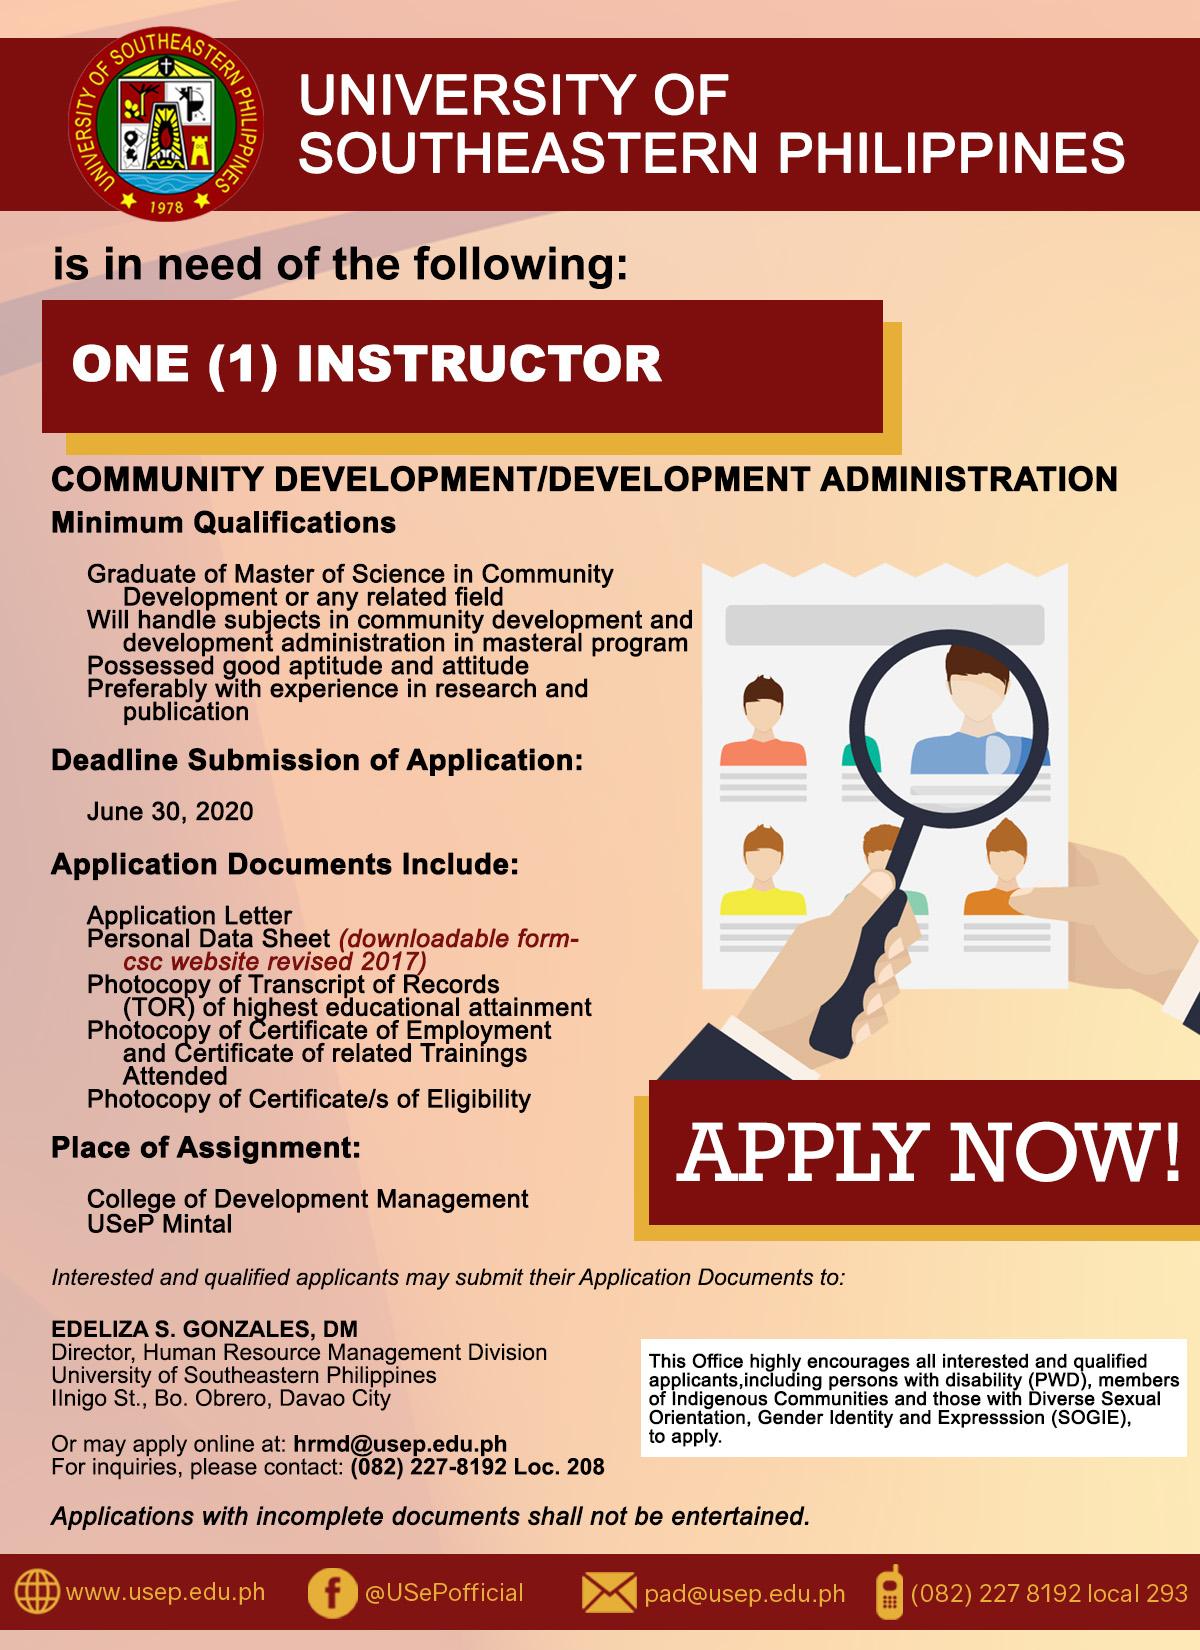 community-development-or-development-administration